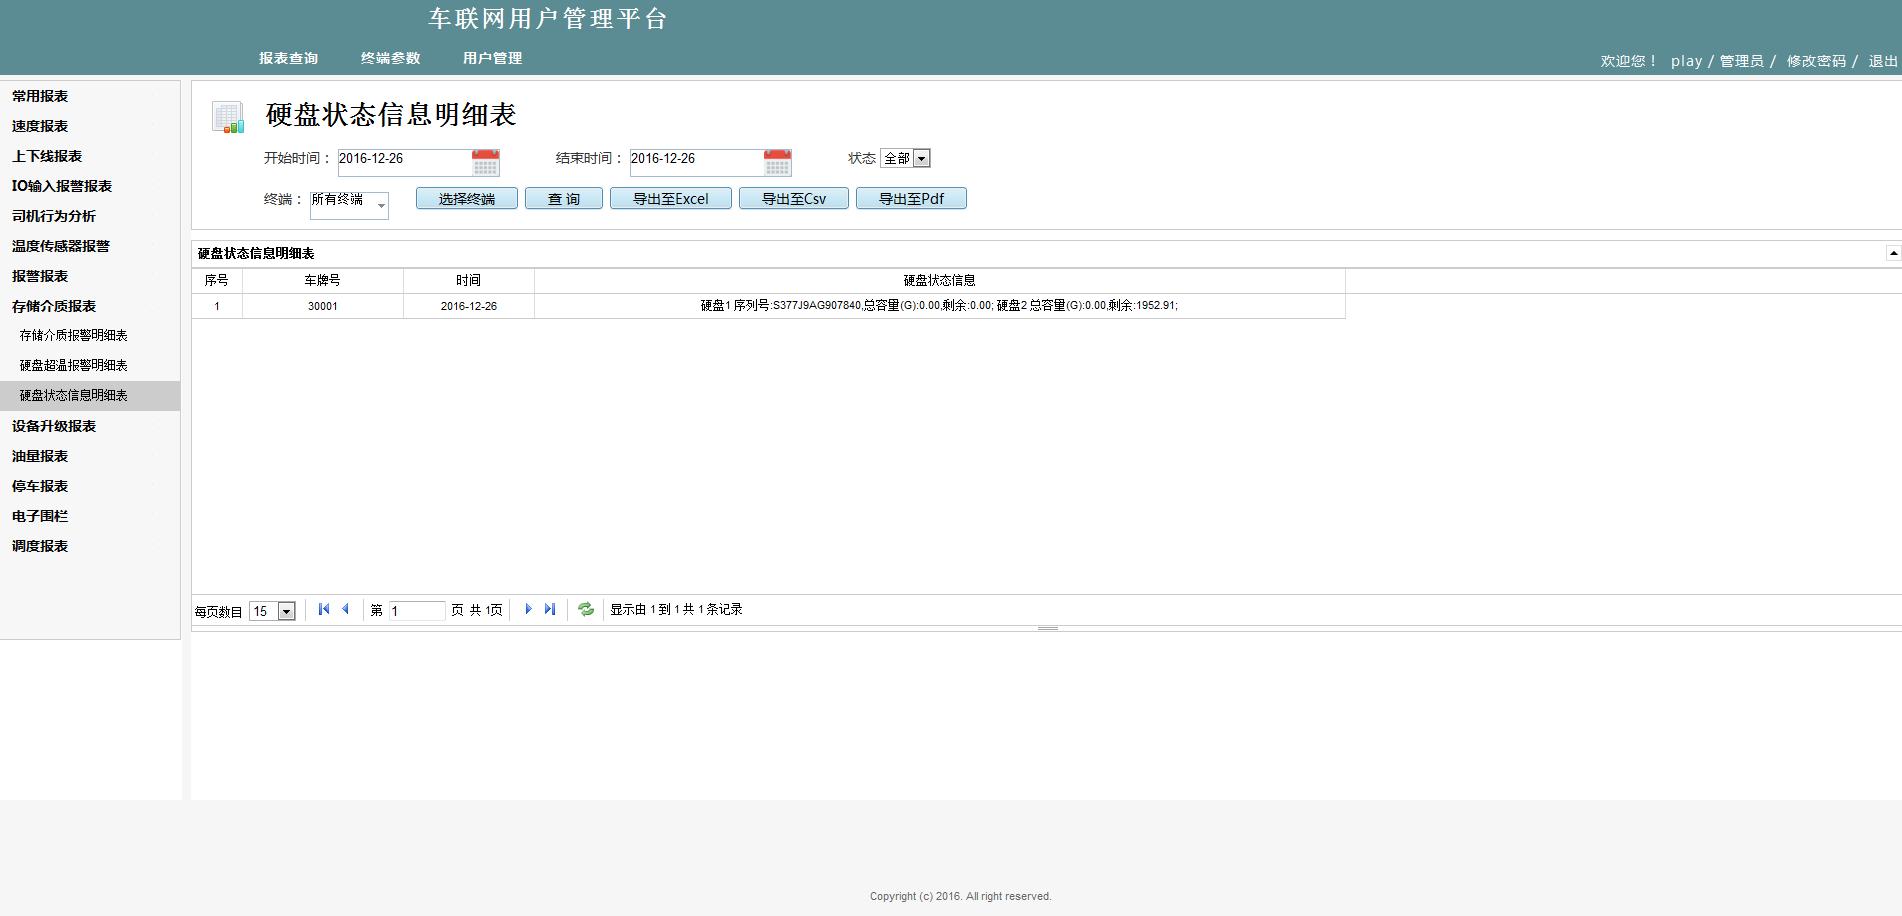 IVMS WEB客户端——智能车辆管理系统平台 第8张